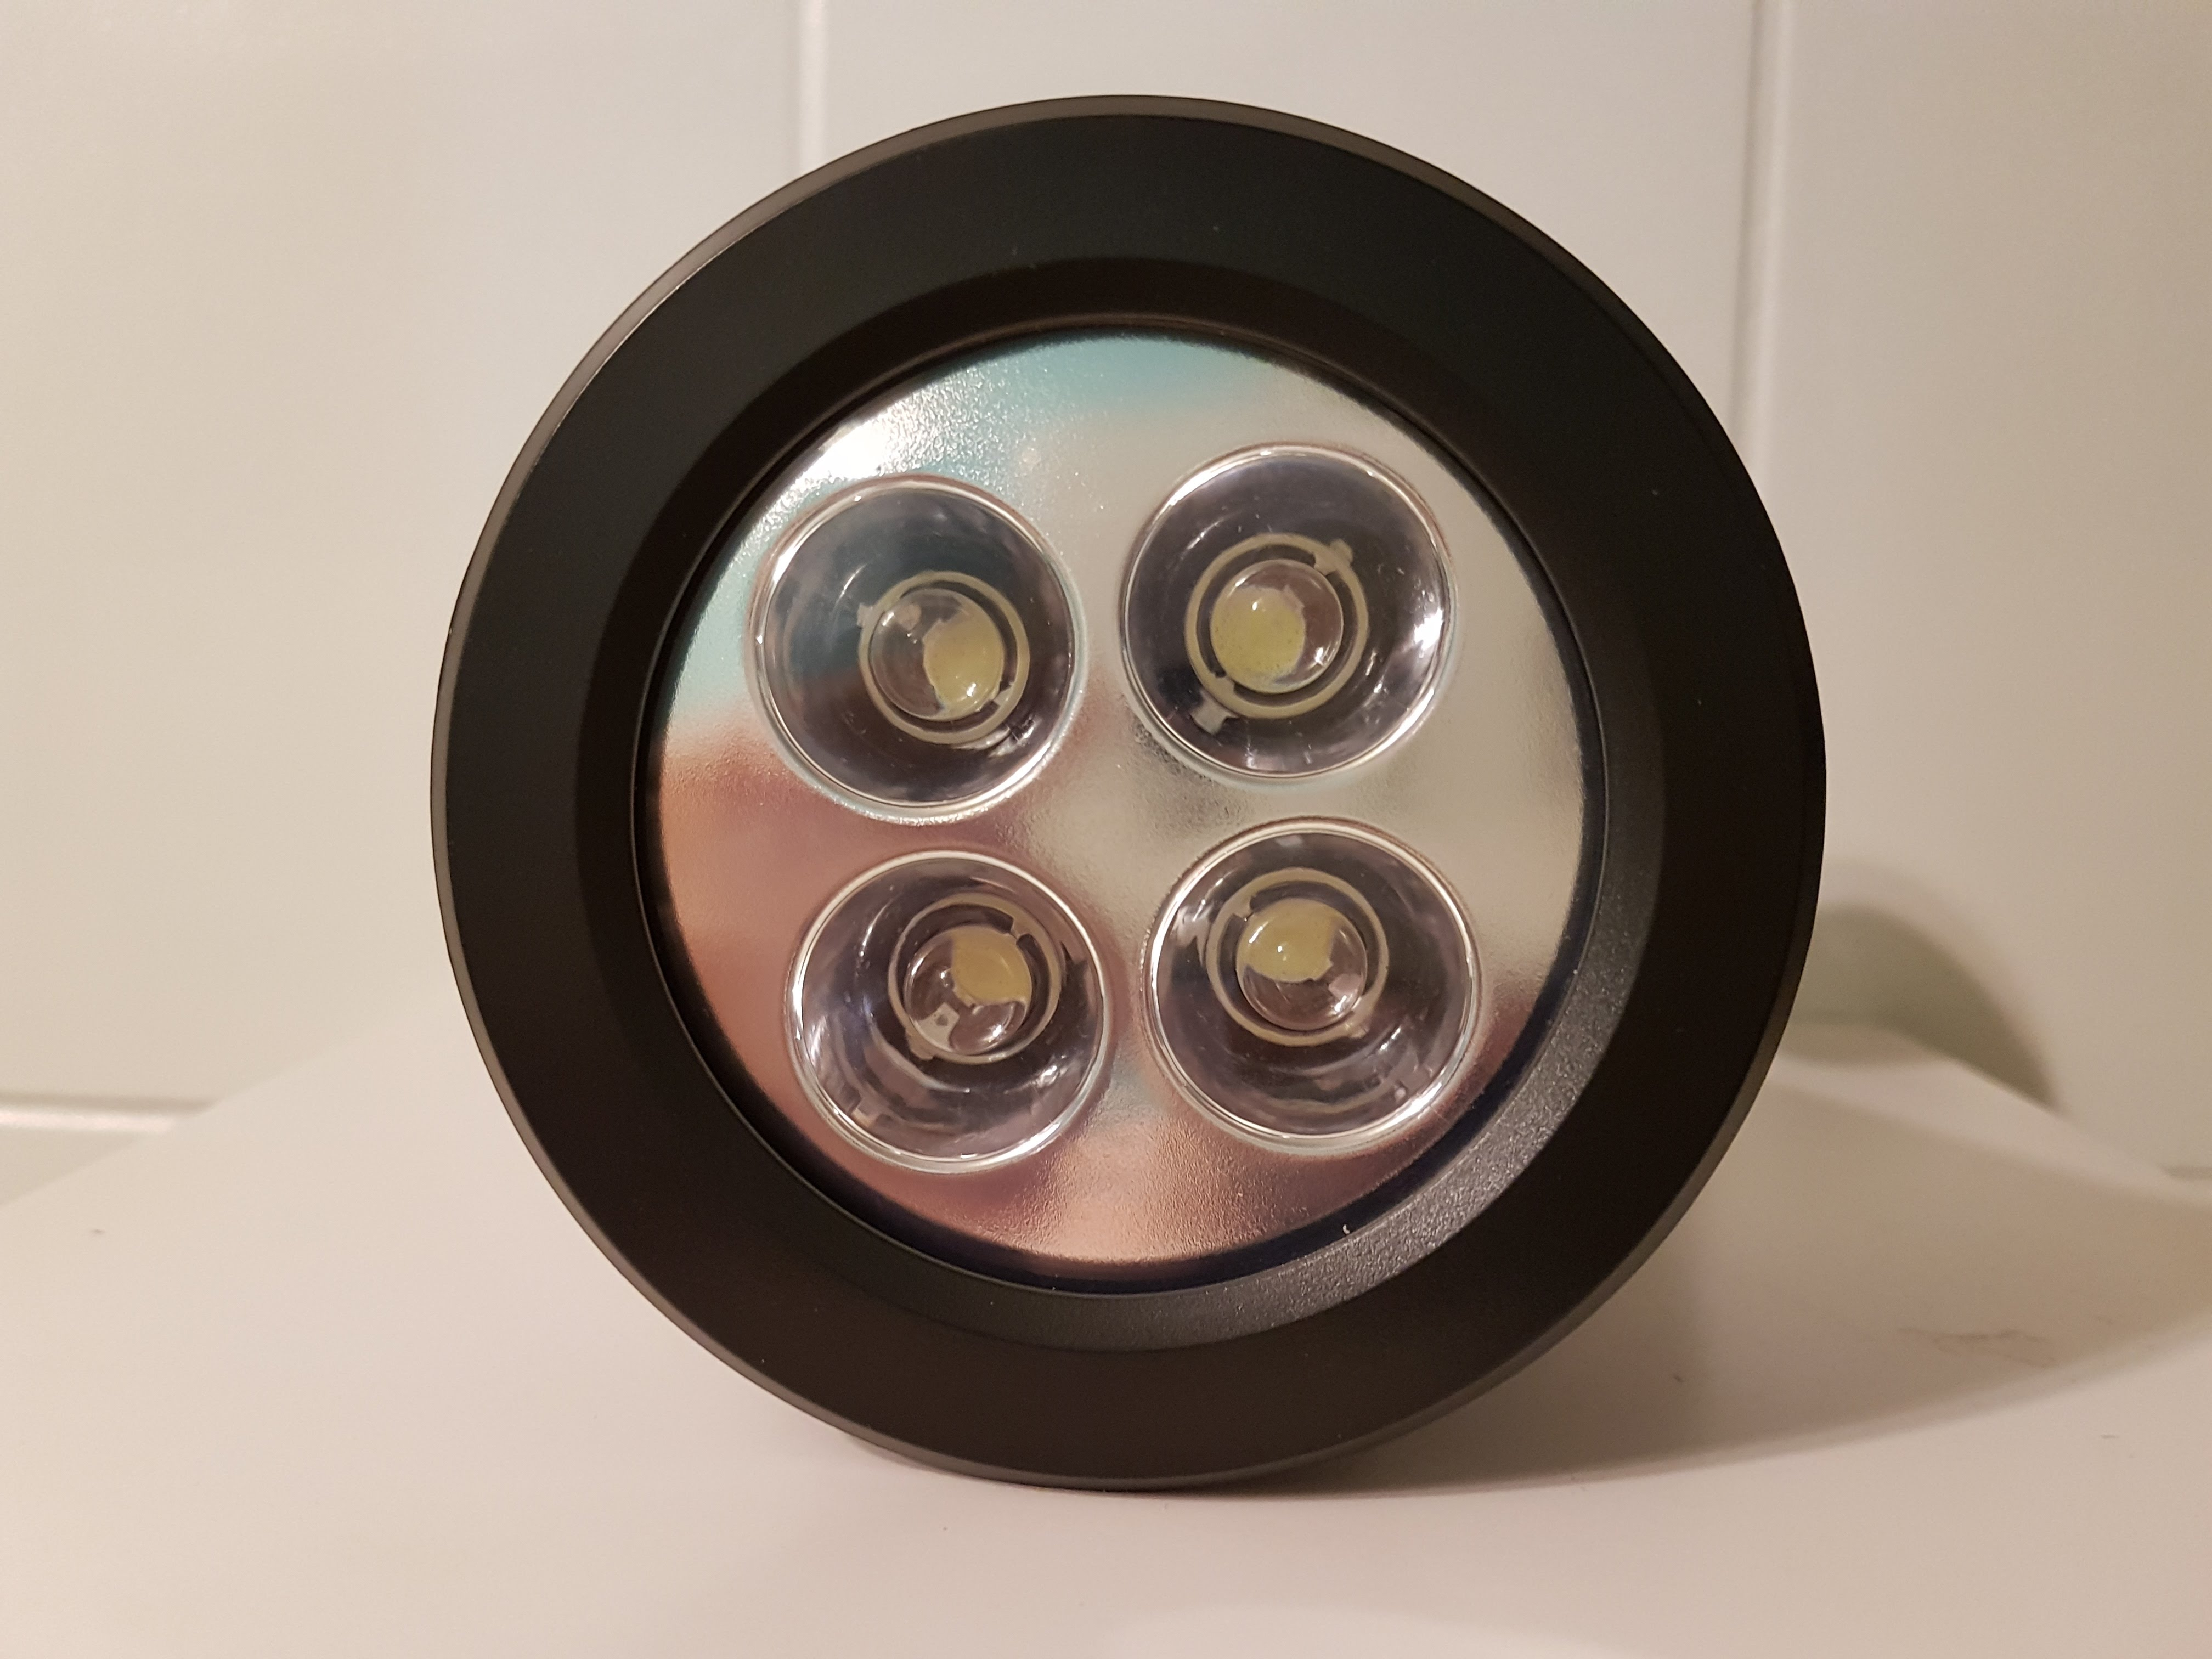 Naisidier-Lampe-Solaire-Pelouse-Jardin-4-LED - Naisidier-Lampe-Solaire-Pelouse-Jardin-4-LED-14.jpg